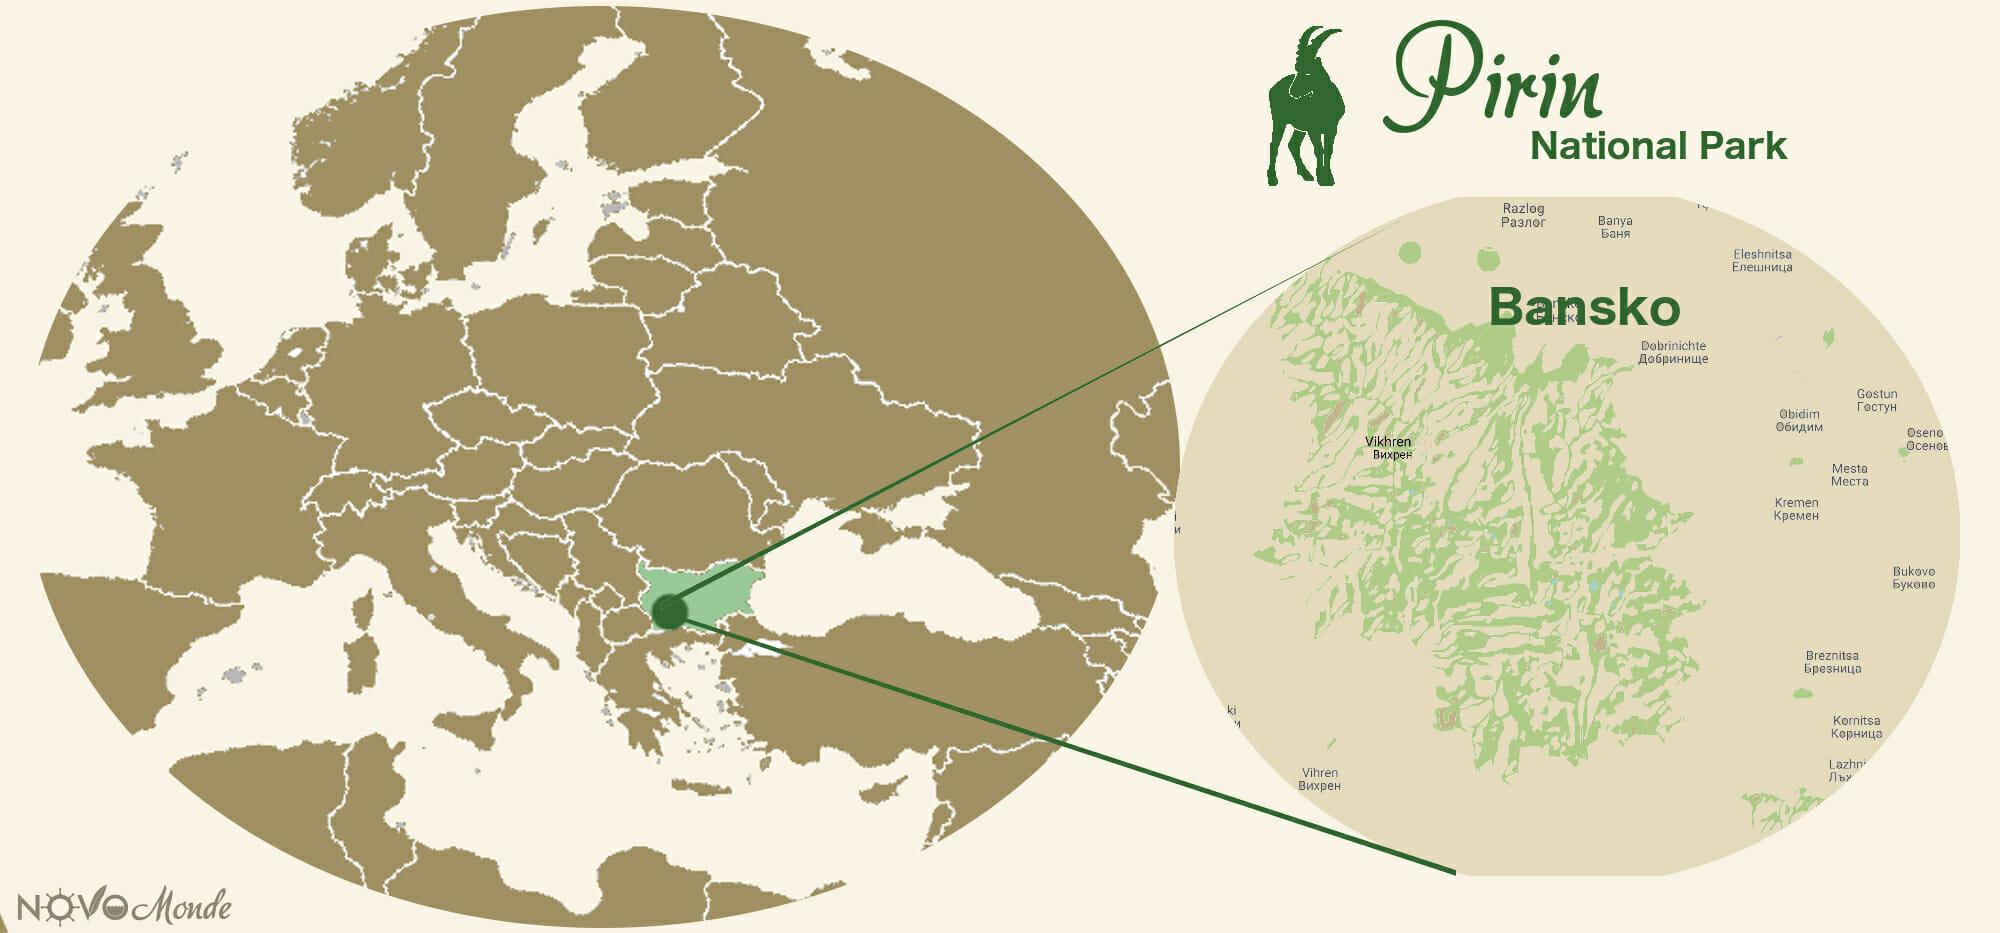 pirin national park bulgaria